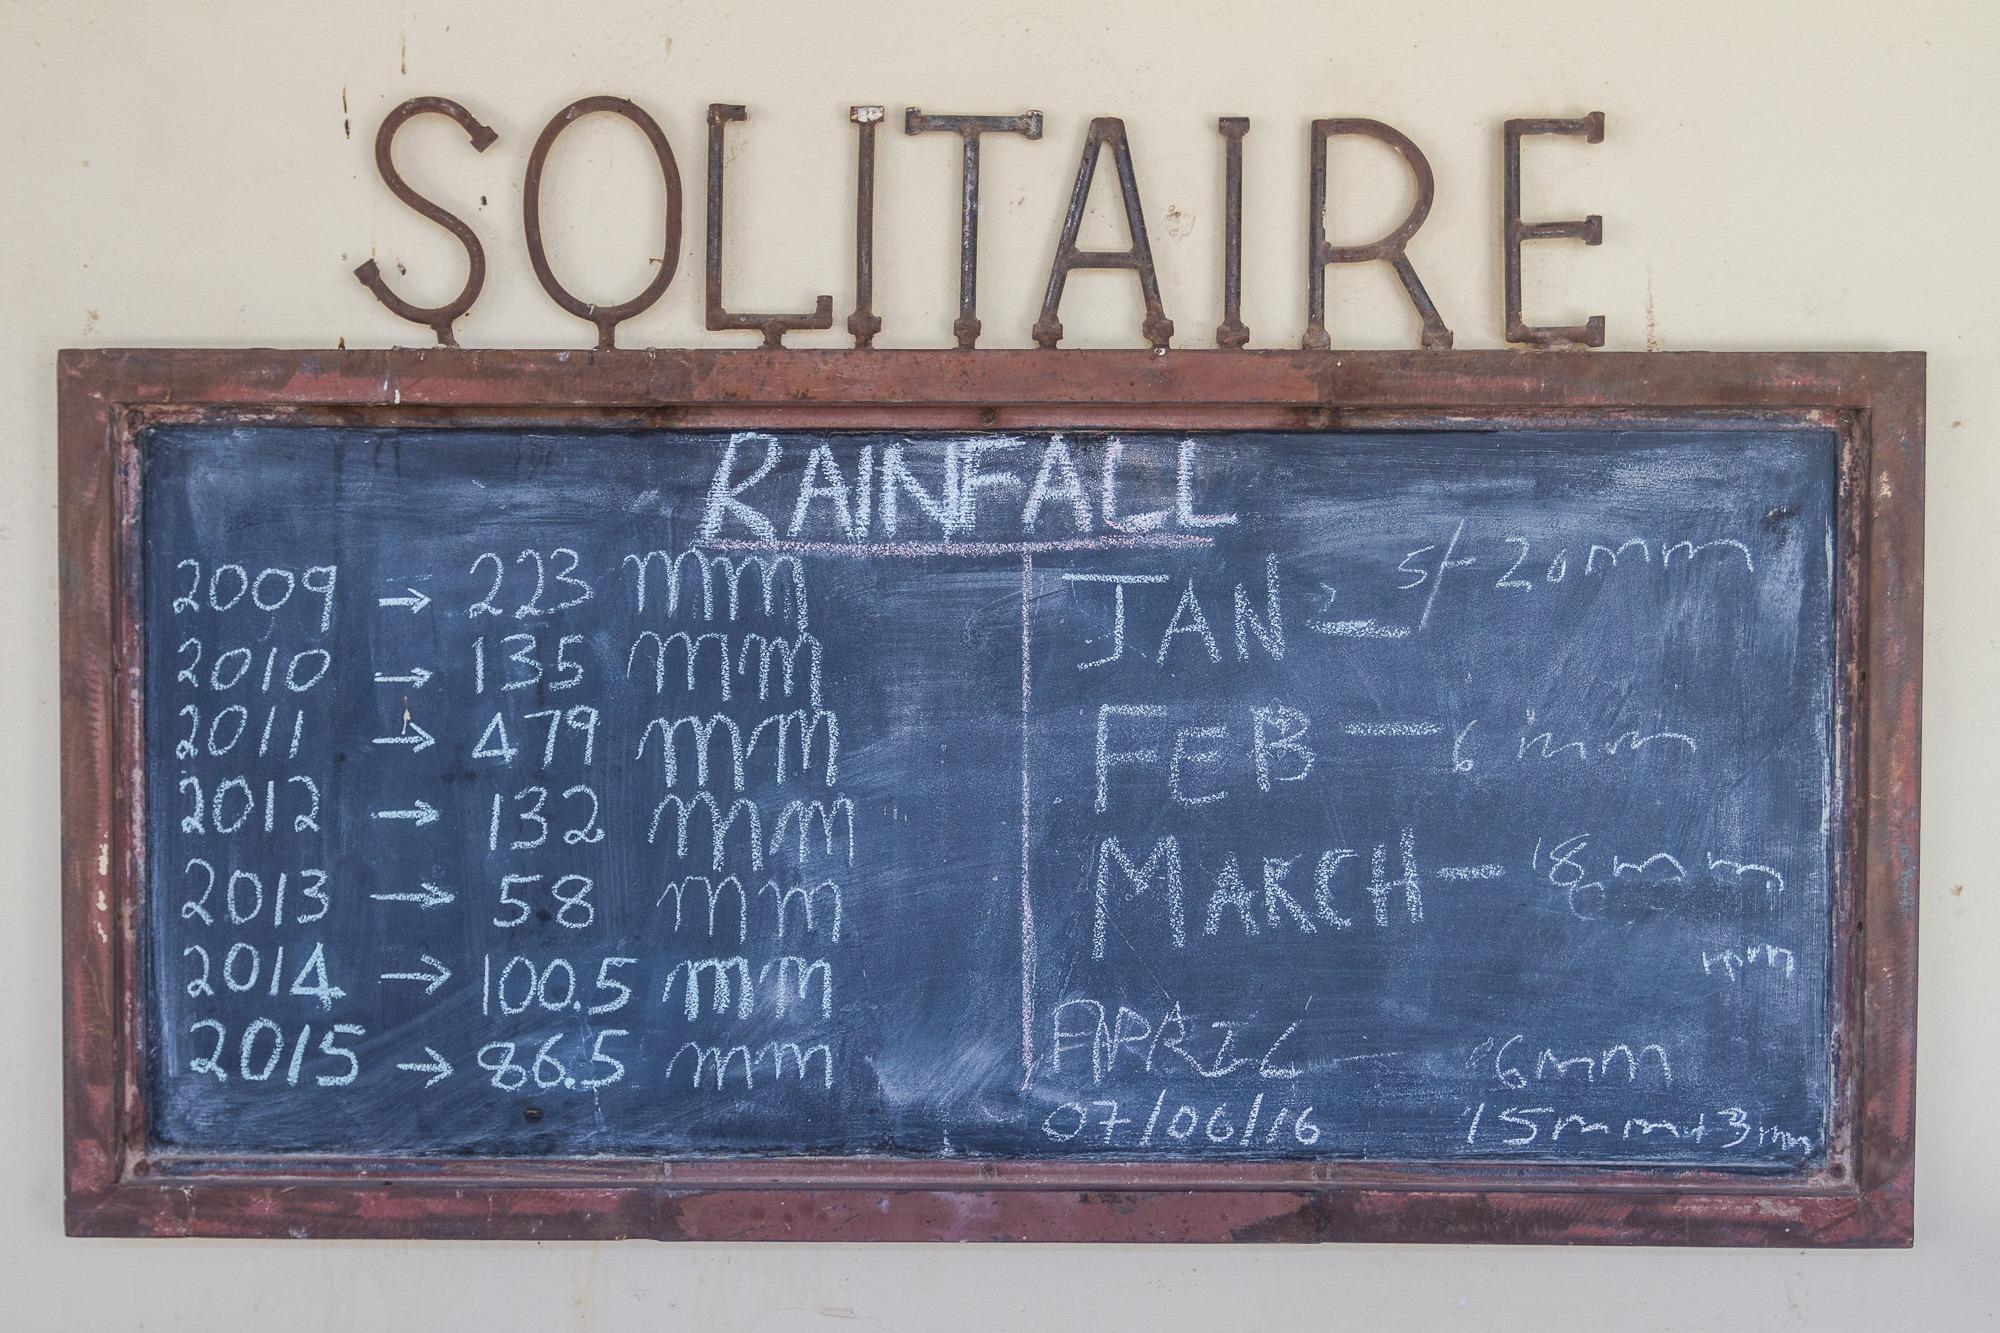 Regen Jahresmenge in Solitaire Namibia